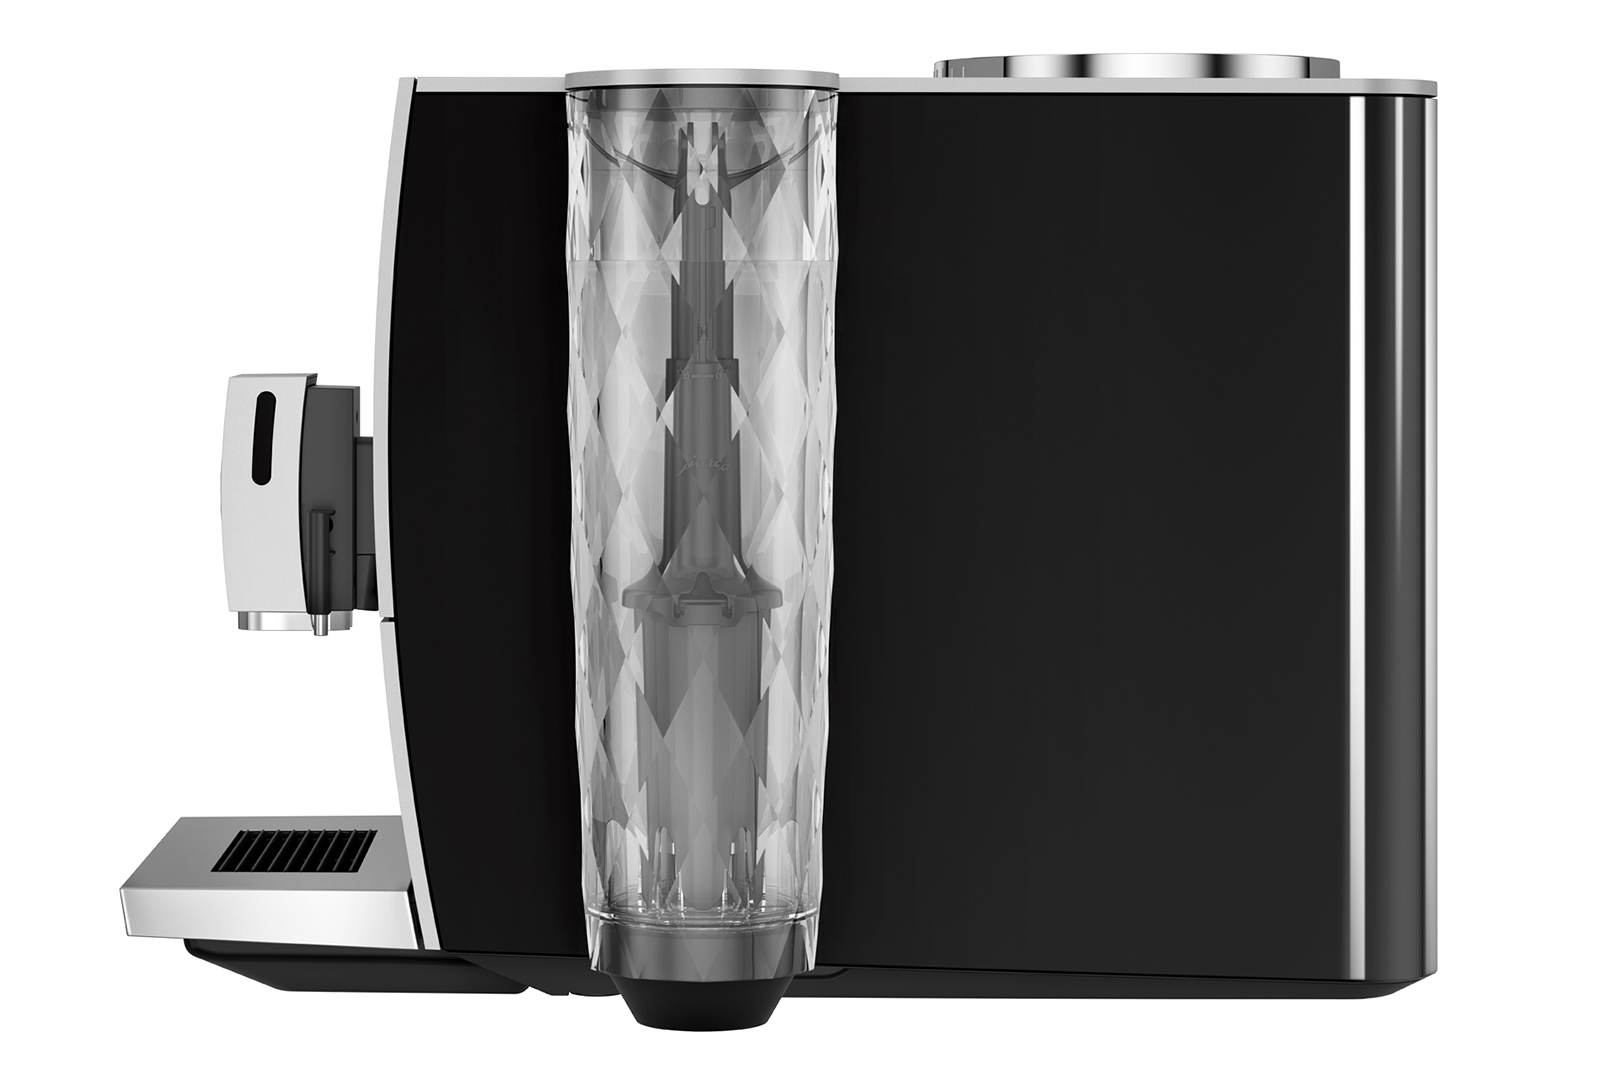 Jura ENA 8 Superautomatic Espresso Machine - Metropolitan Black